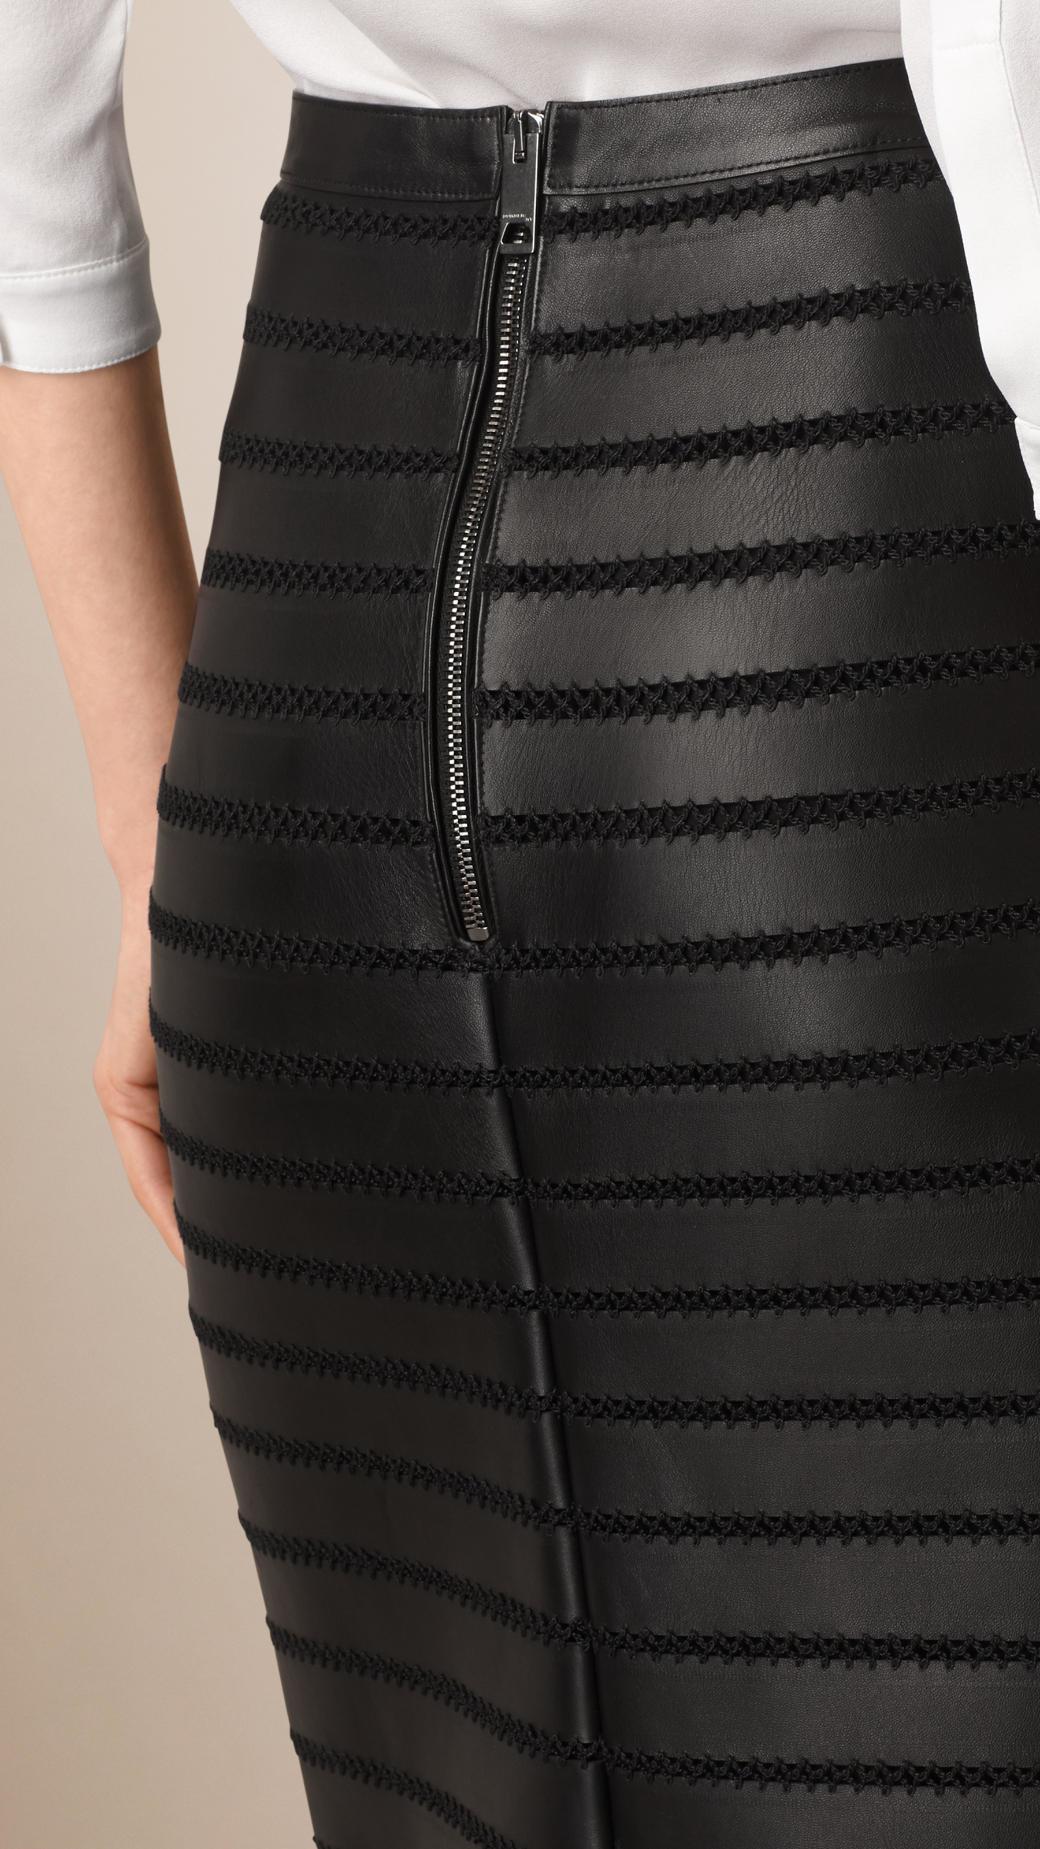 burberry panelled bonded lambskin pencil skirt in black lyst